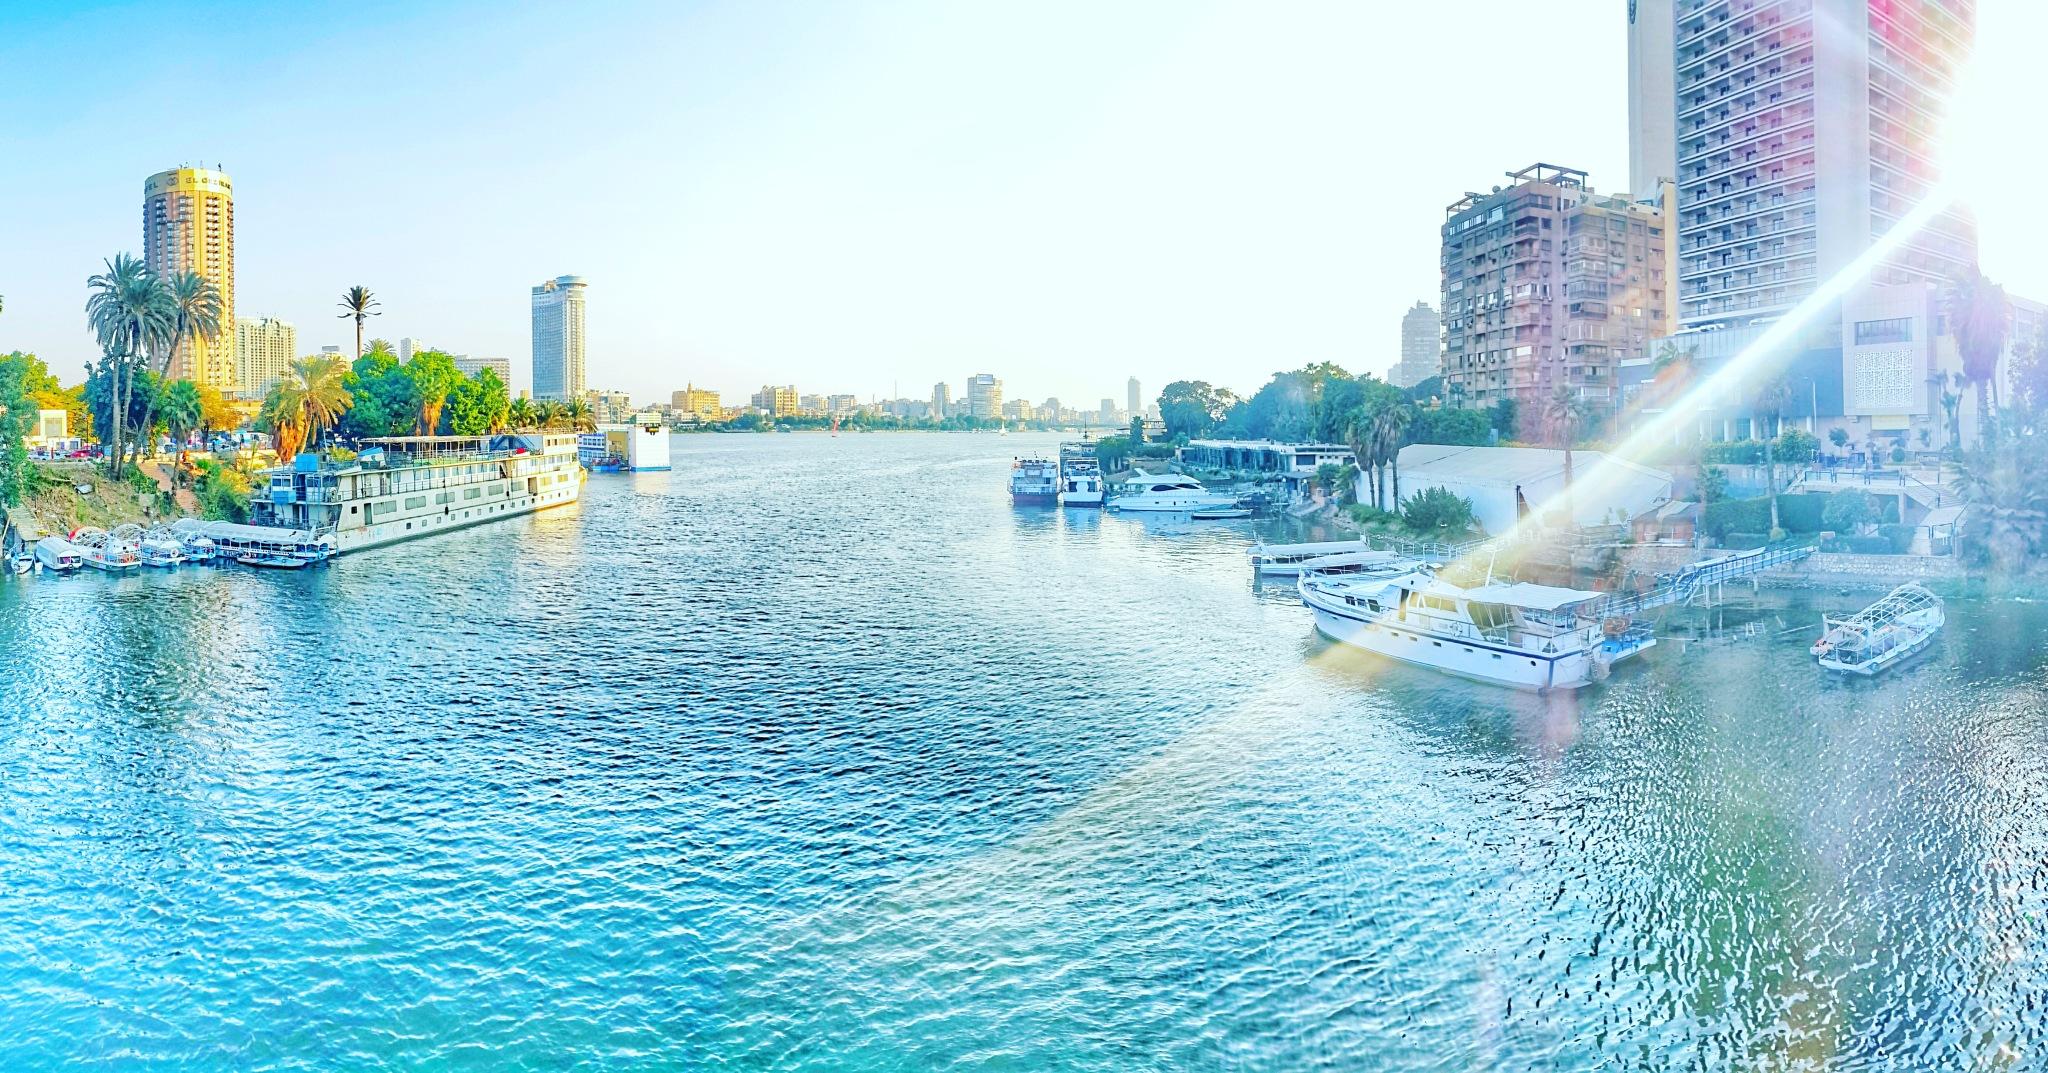 The Nile  by John Hakim